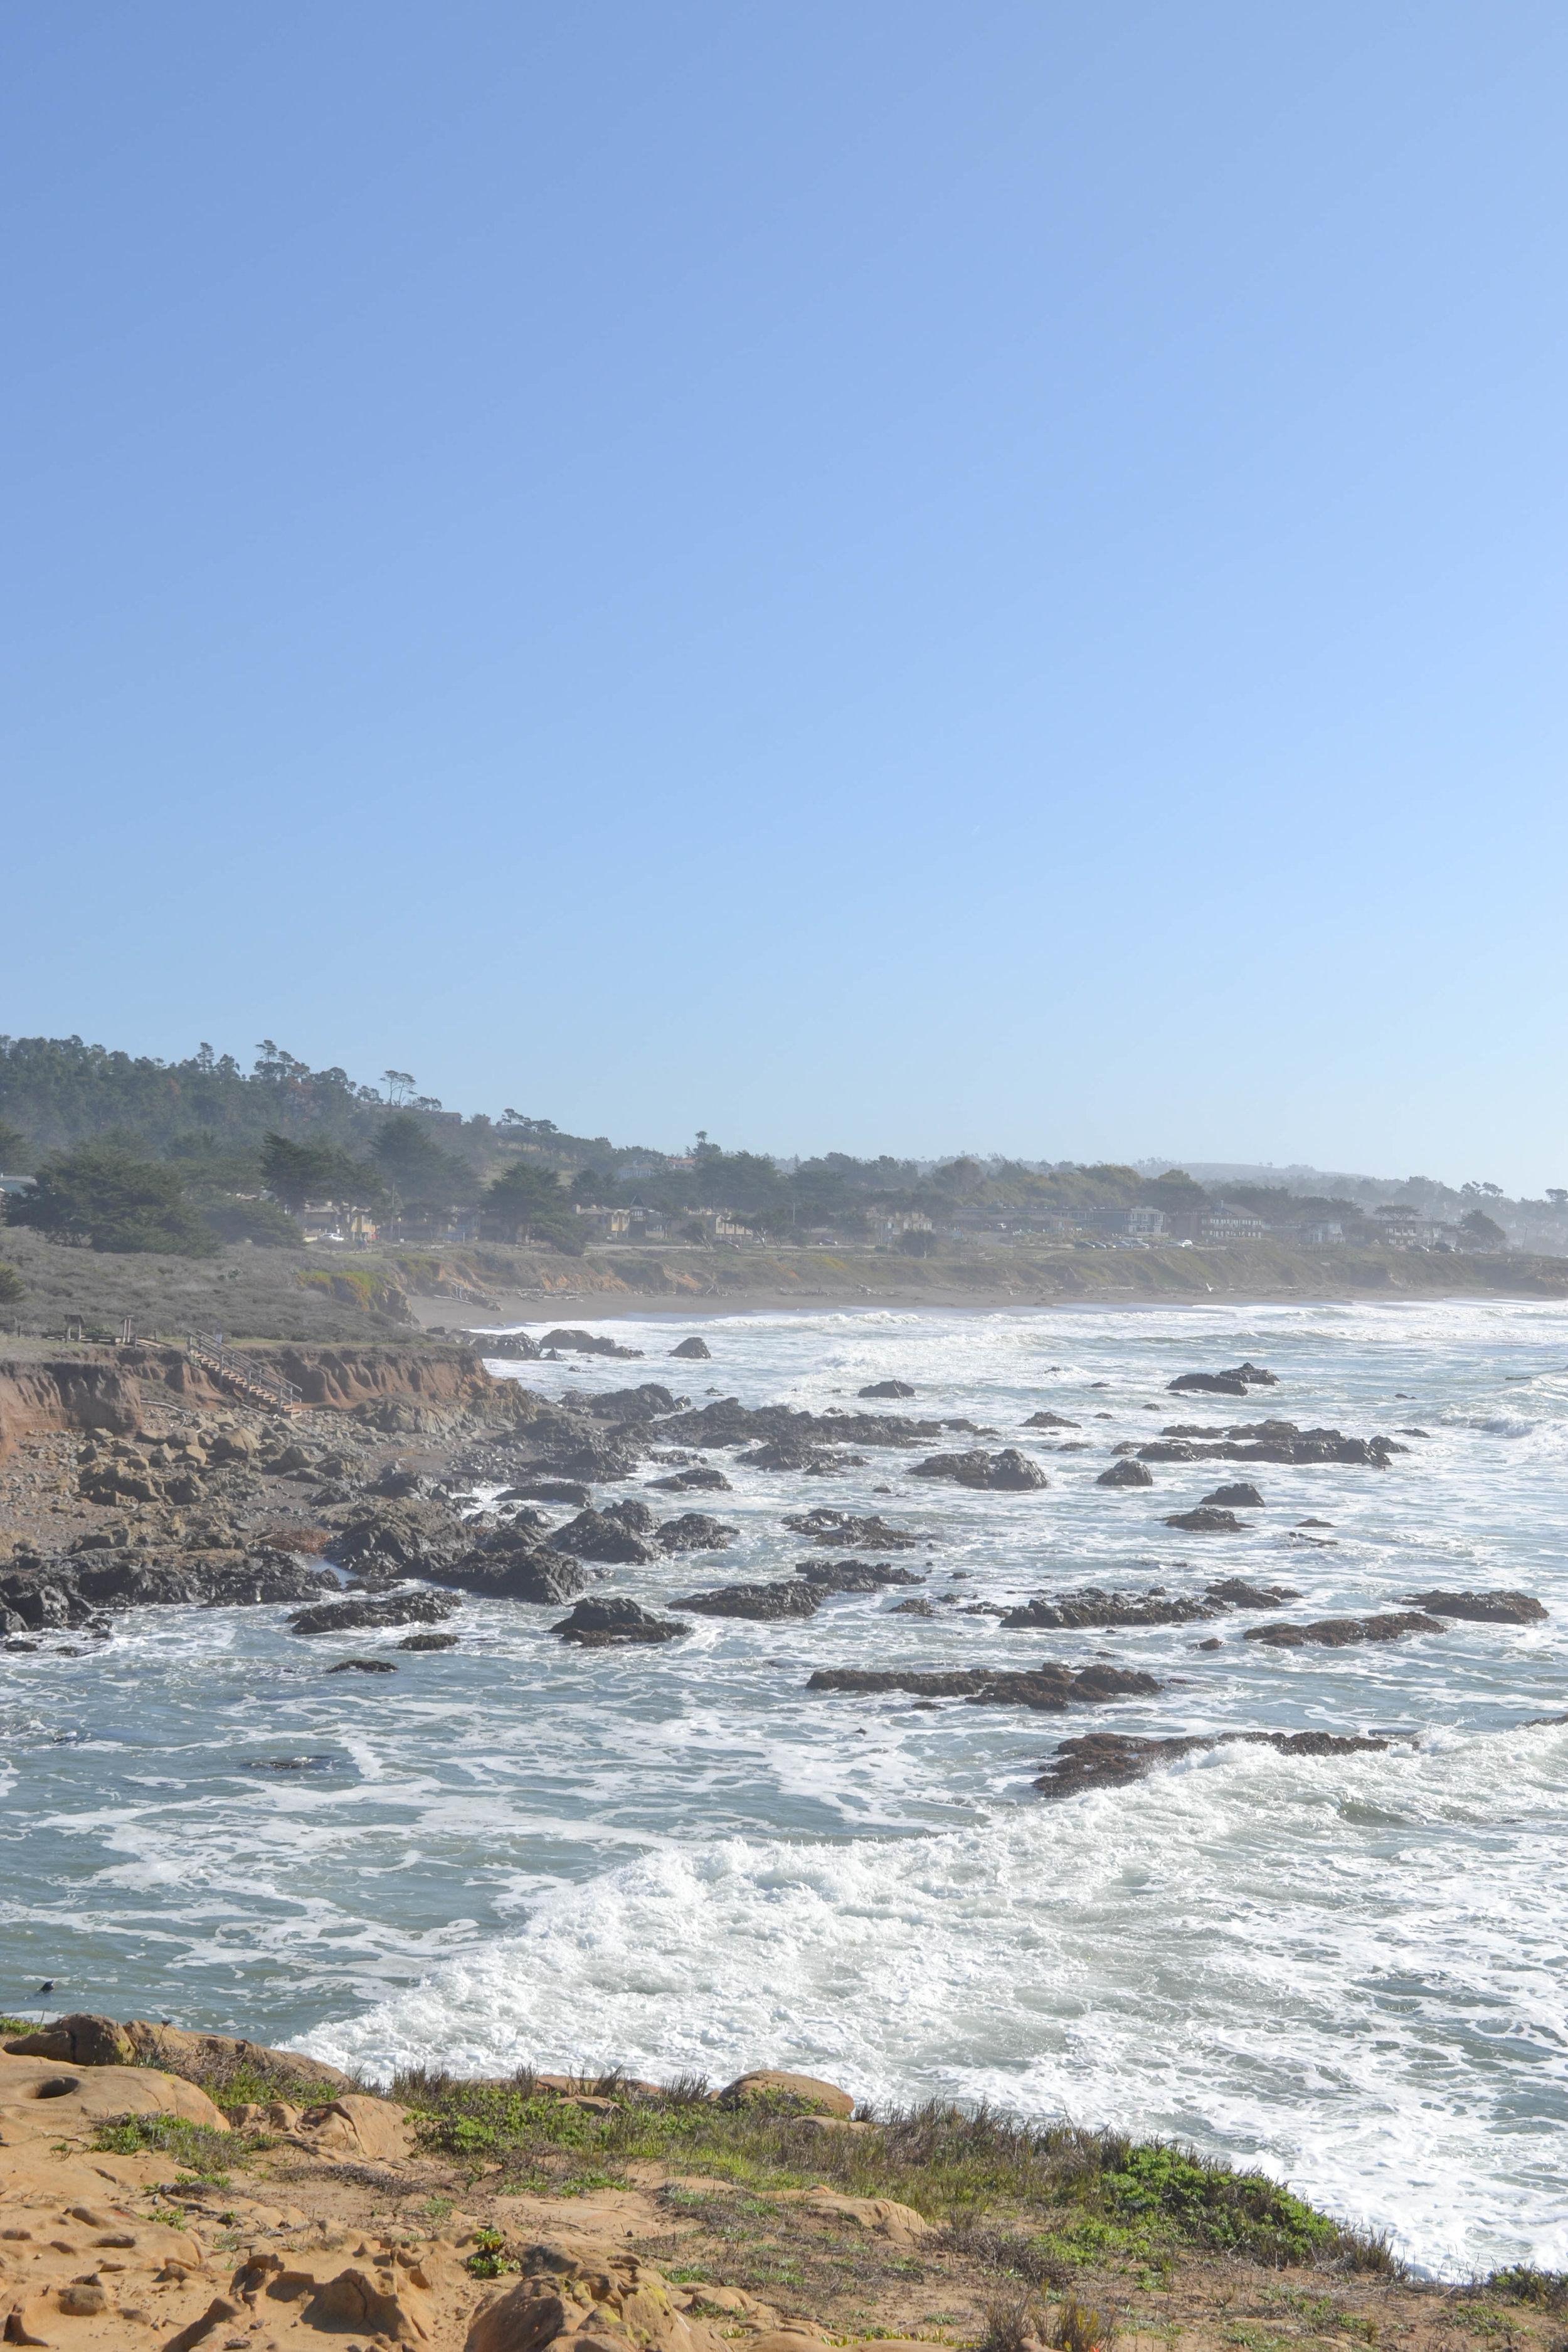 bri rinehart; photography; cambria; california